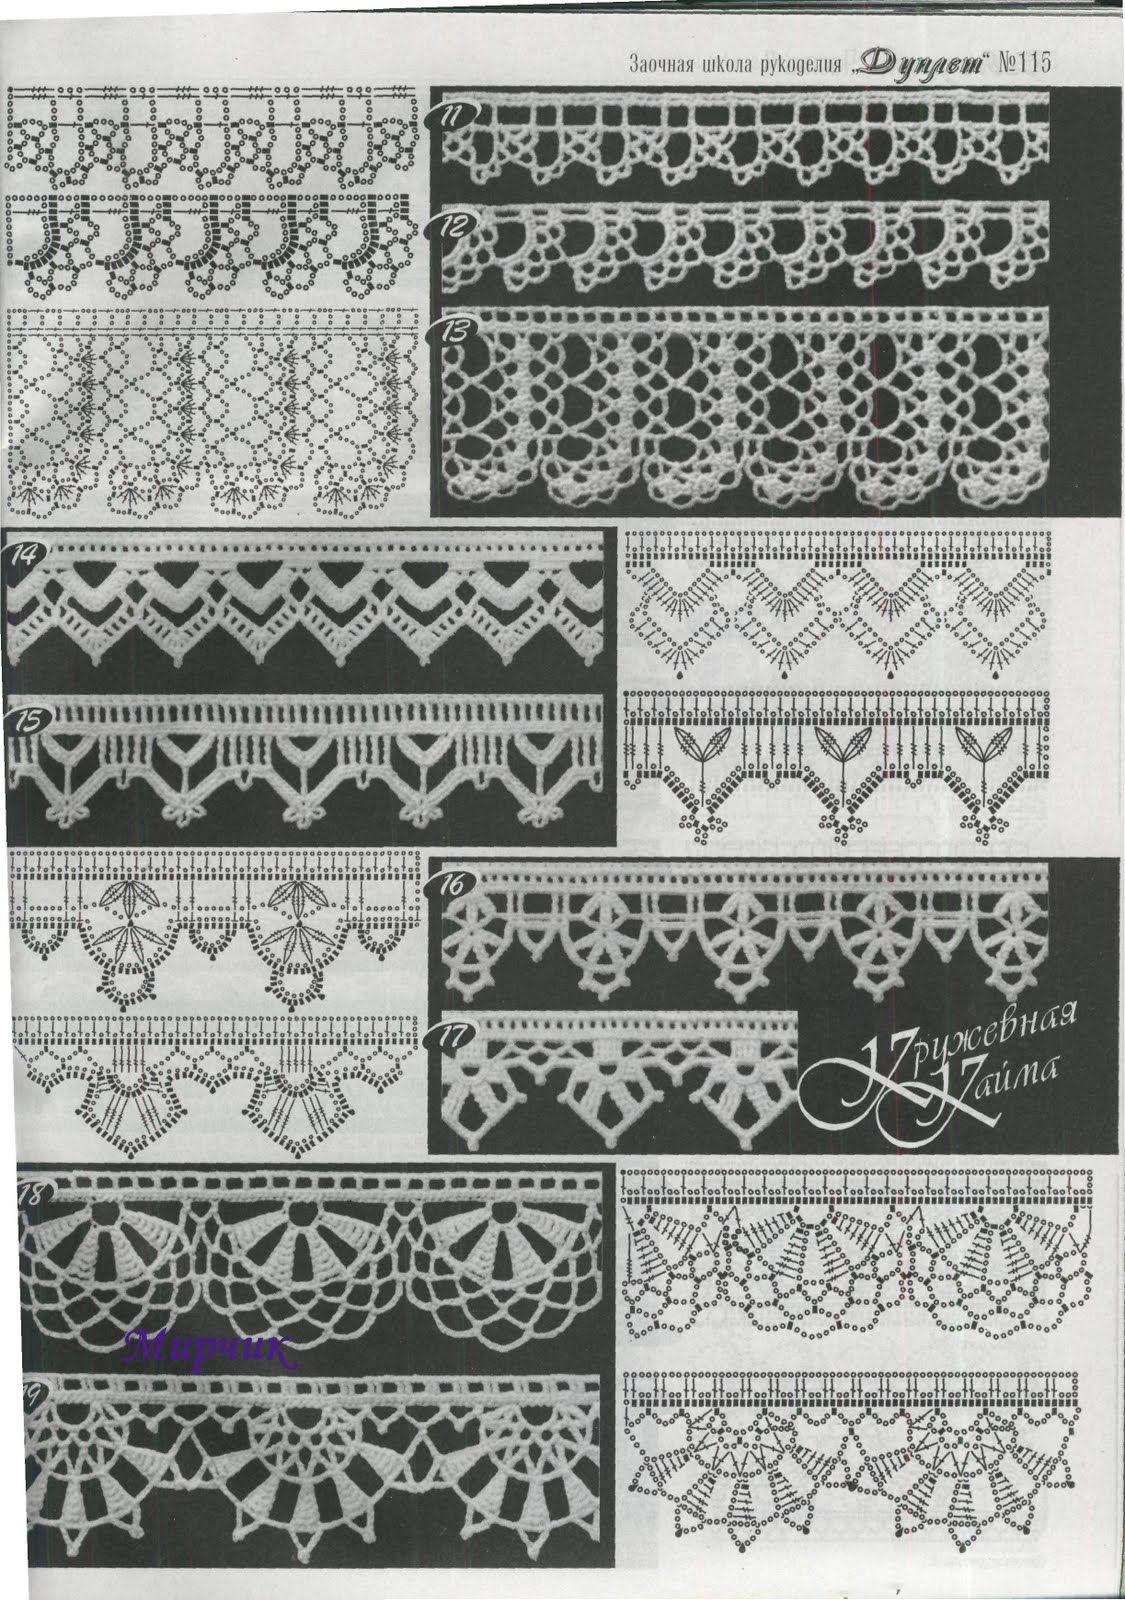 Hkelmuster borte hkeln free crochet border pattern hkeln hkelmuster borte hkeln free crochet border pattern bankloansurffo Image collections